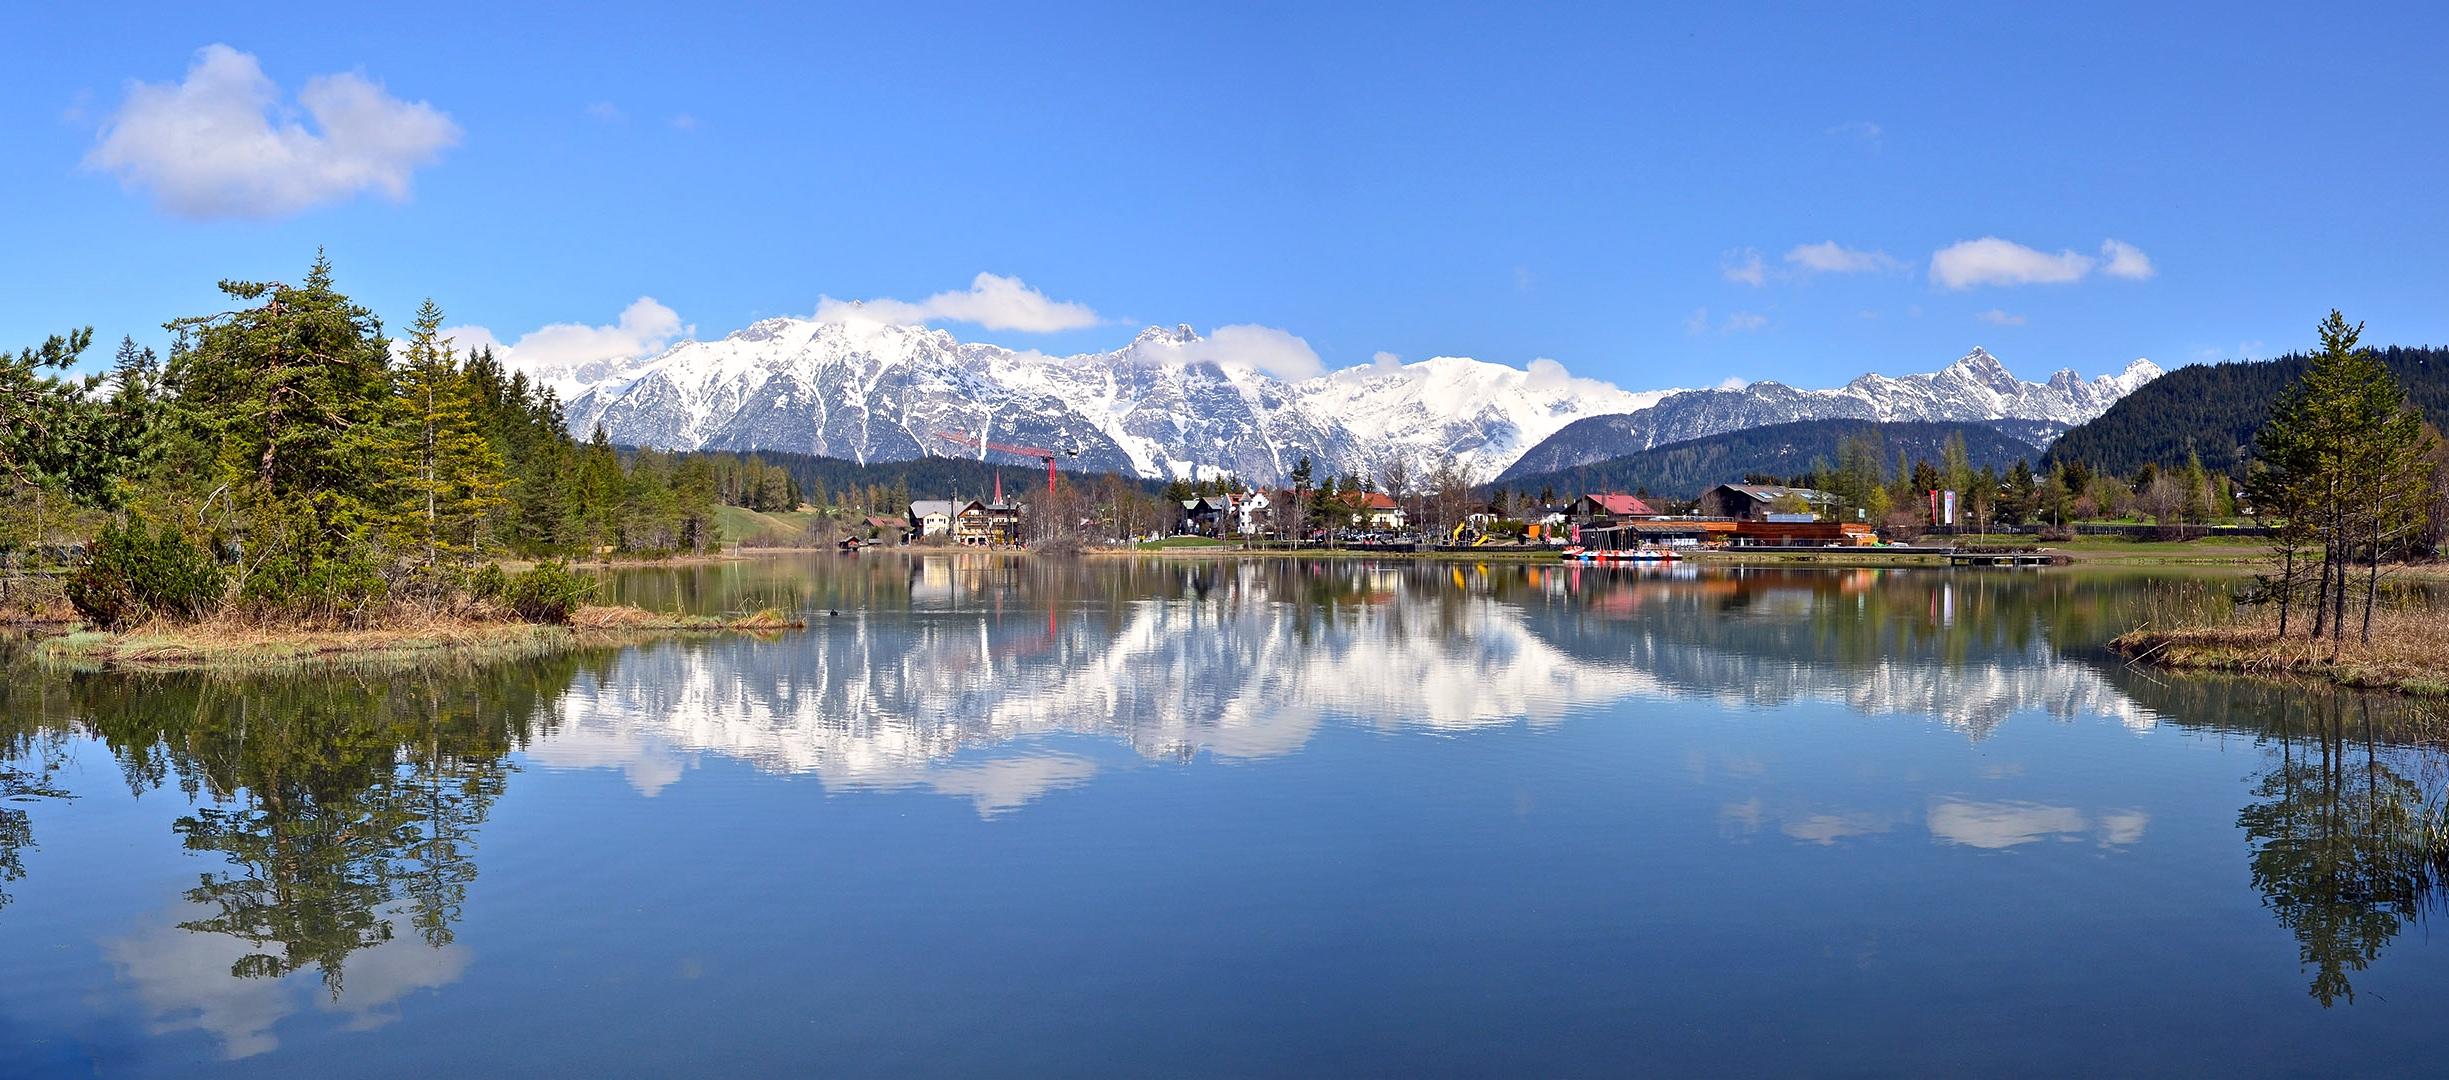 Der  Wildsee bei Seefeld in Tirol